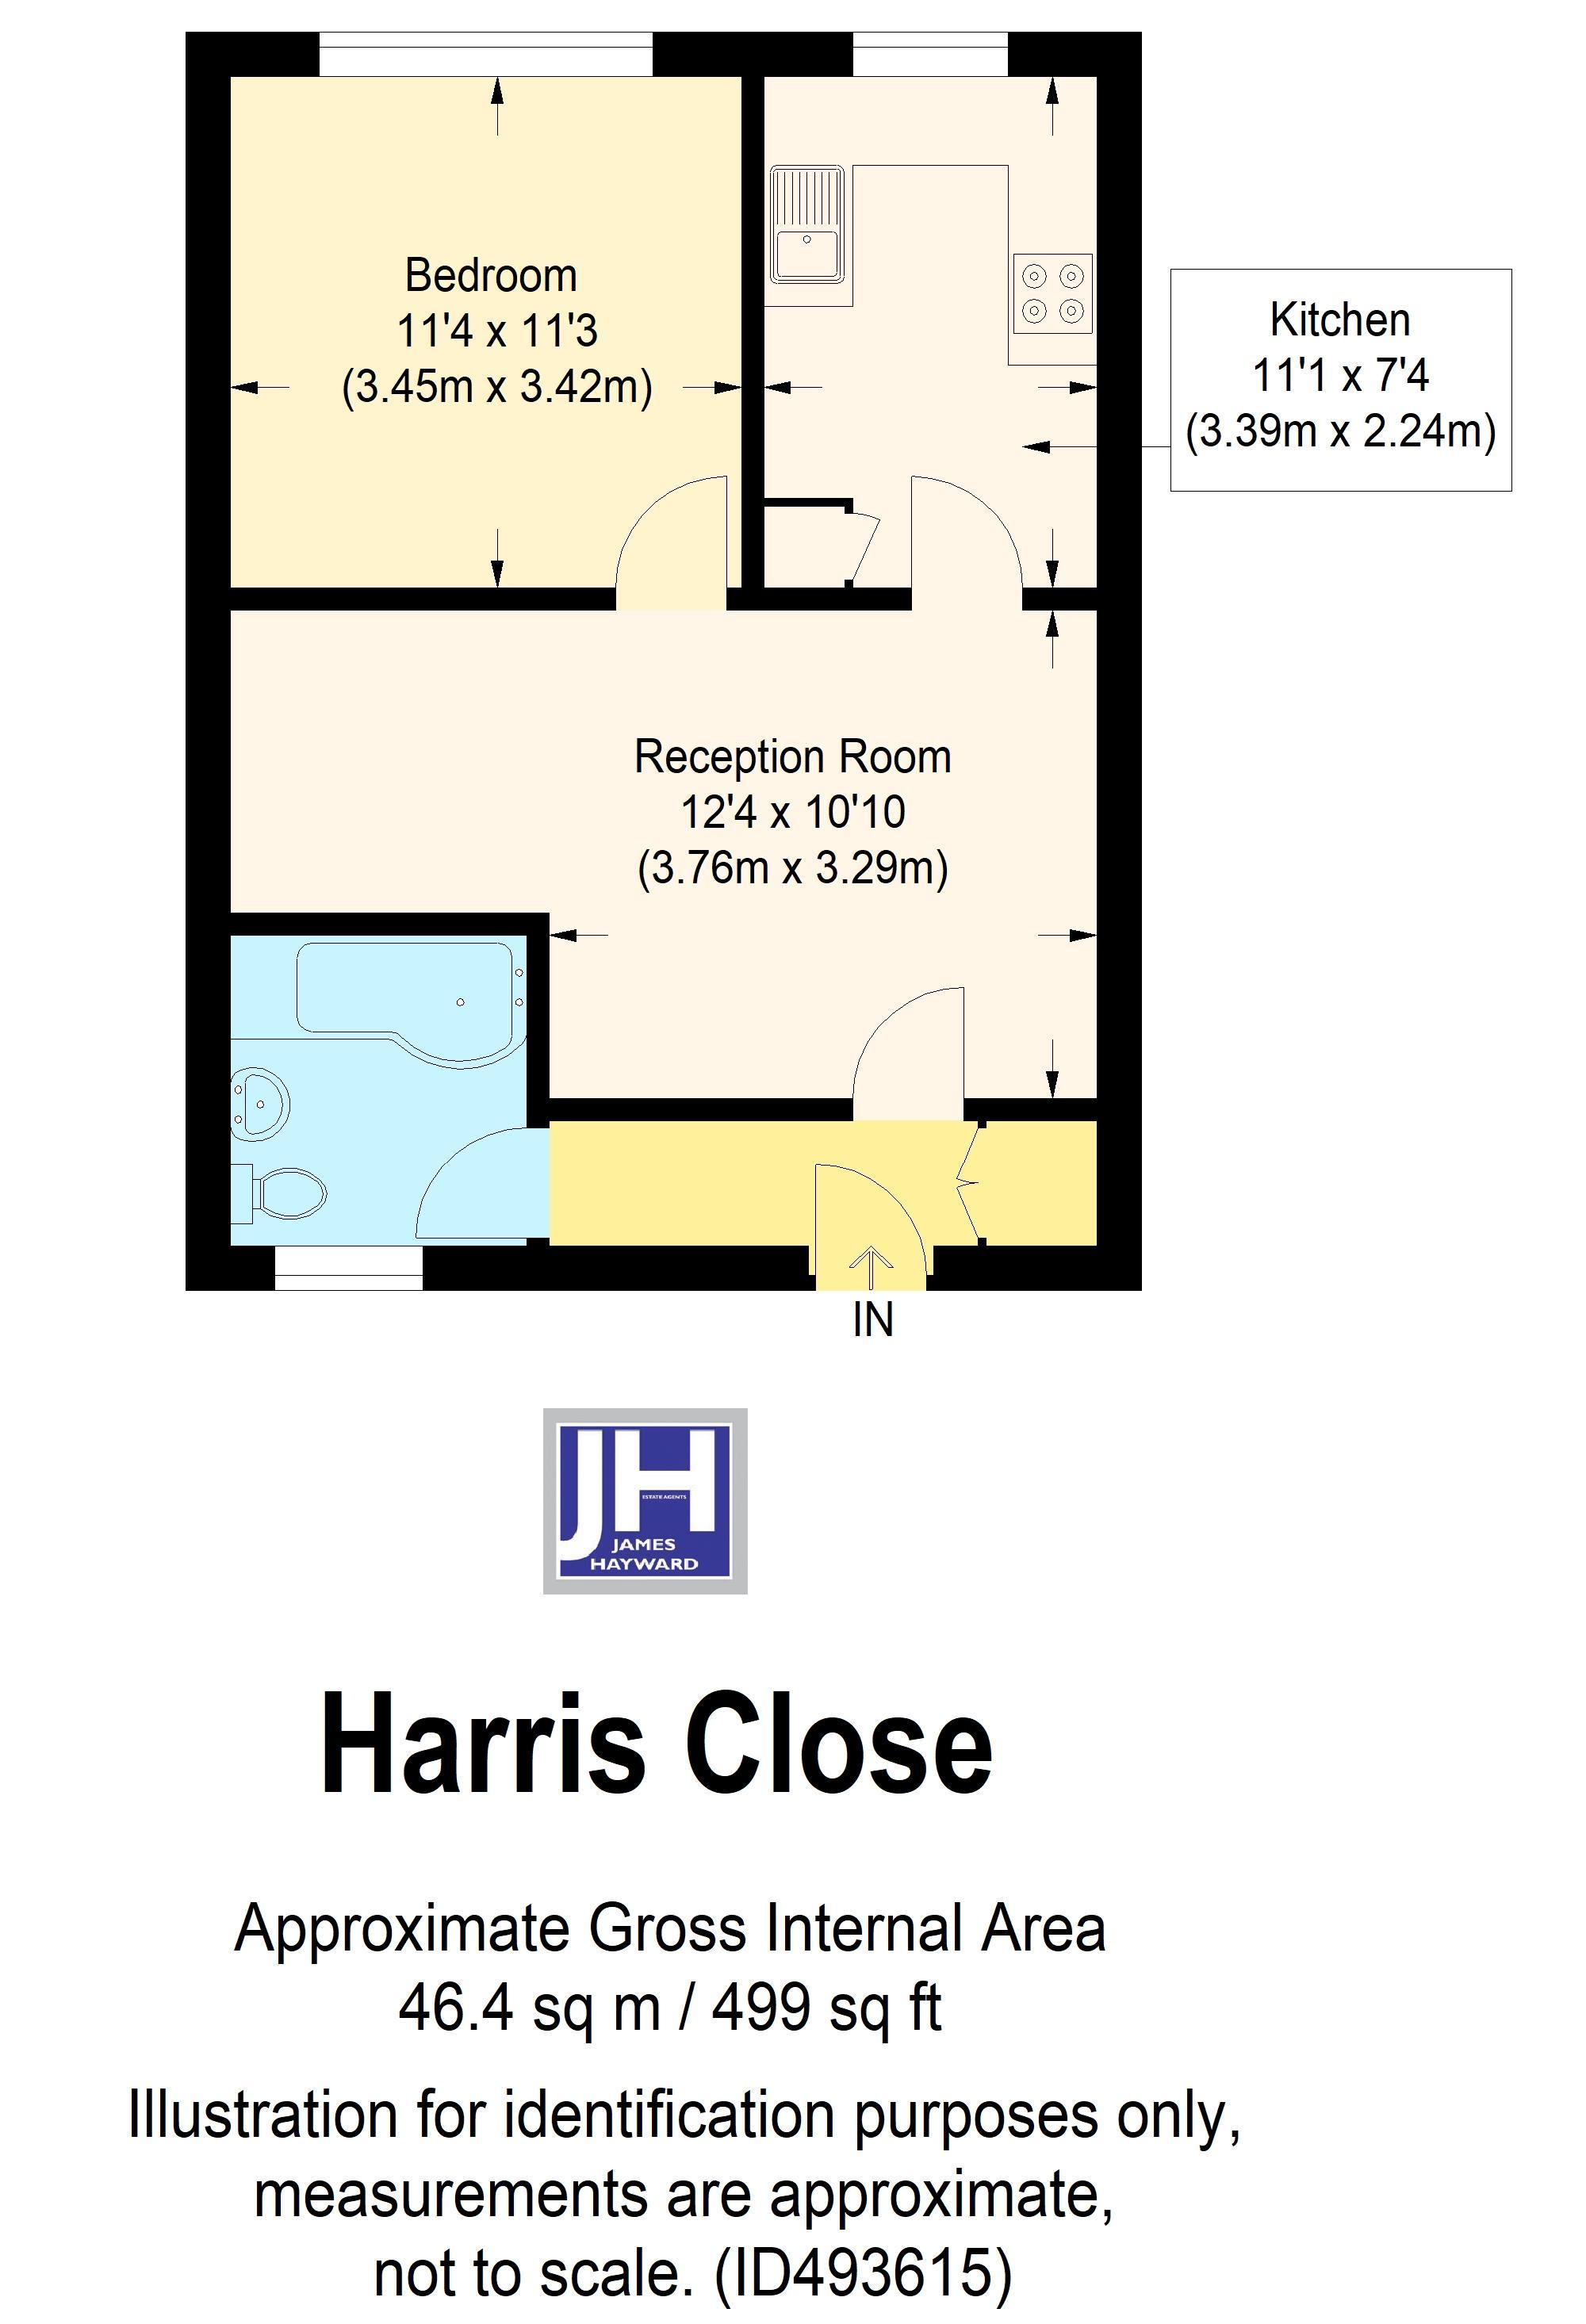 Harris Close